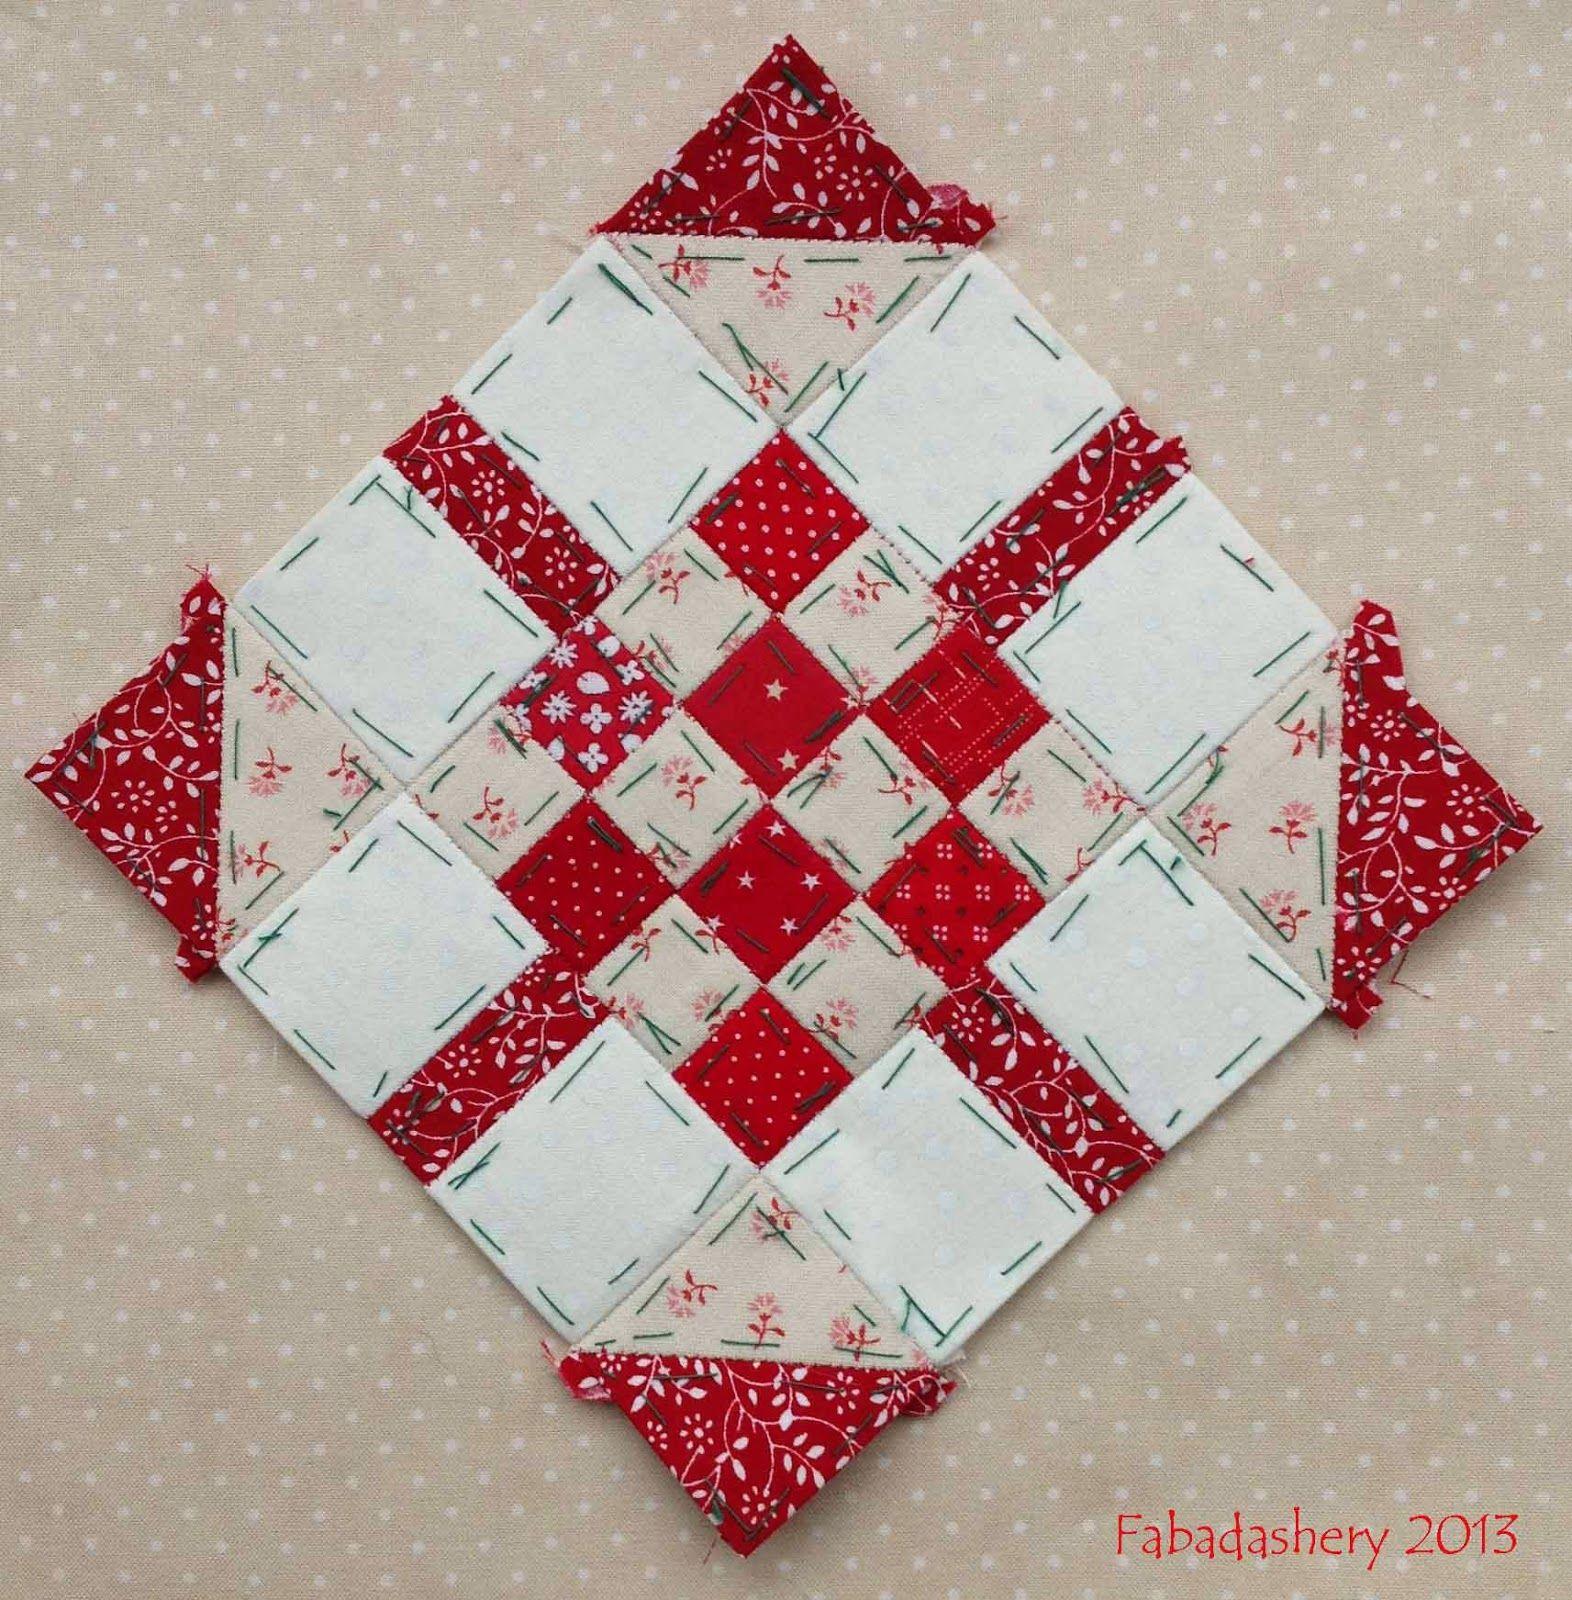 Fabadashery Nearly Insane Quilt Block 12 Quilt Blocks Pattern Blocks Quilt Block Patterns